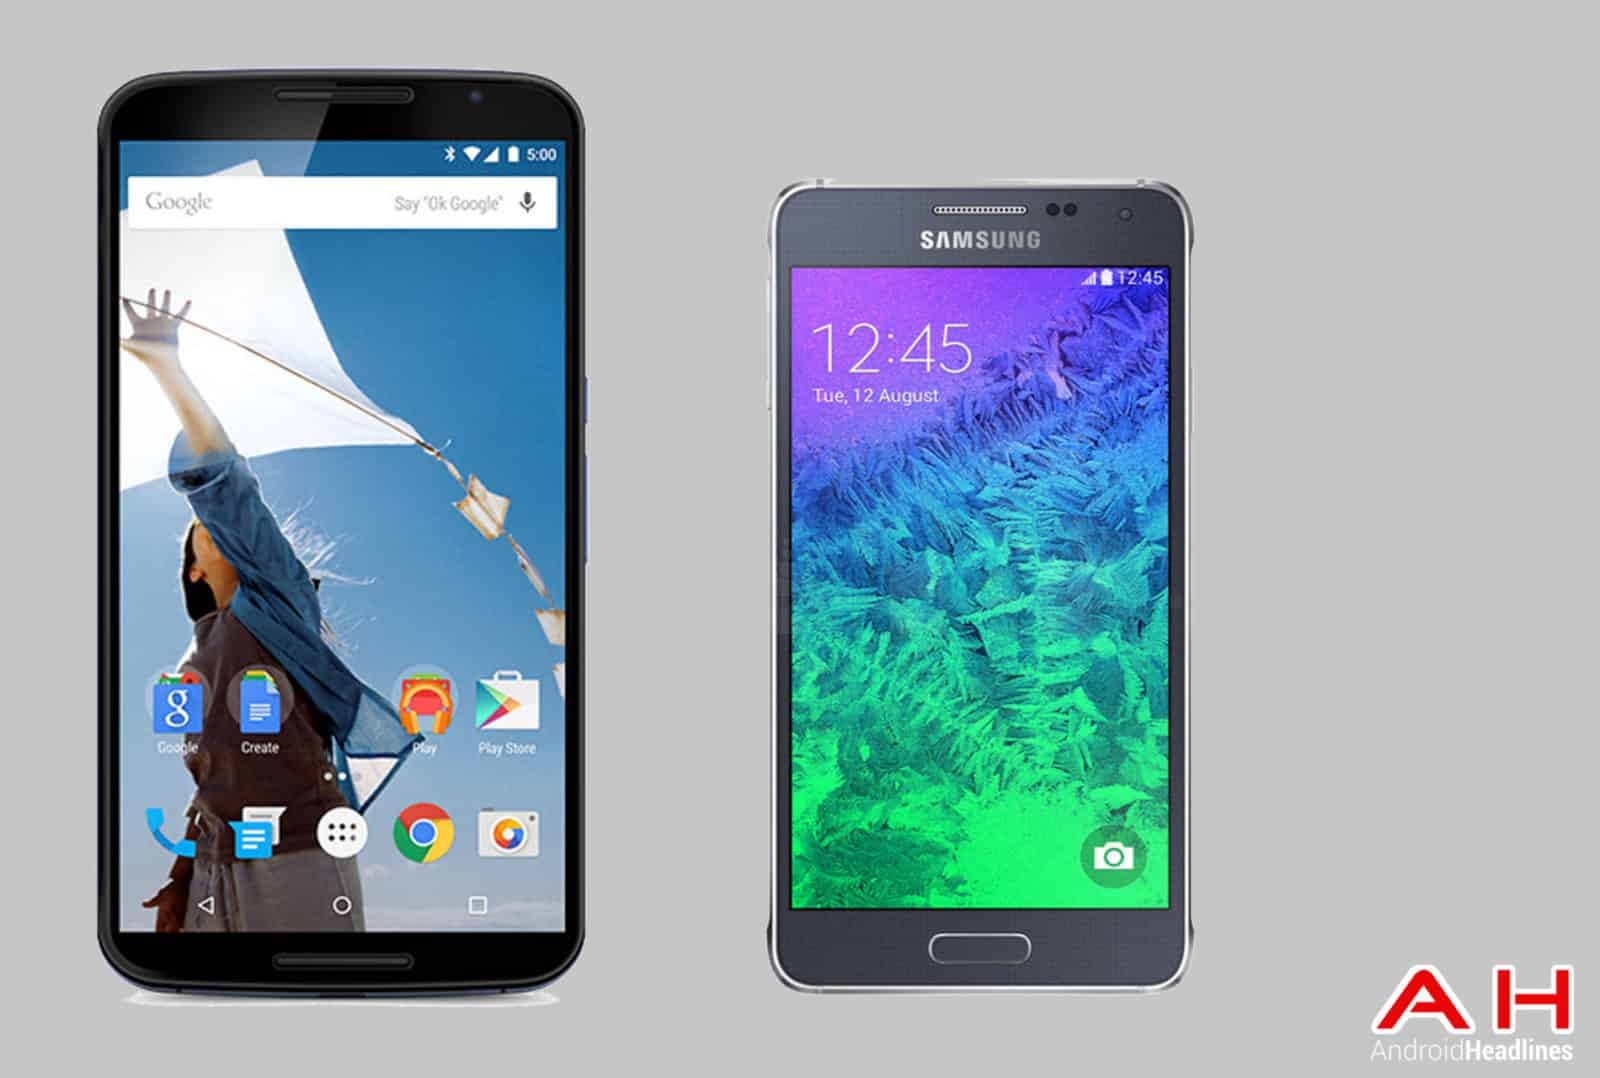 Nexus 6 vs Galaxy Alpha cam AH